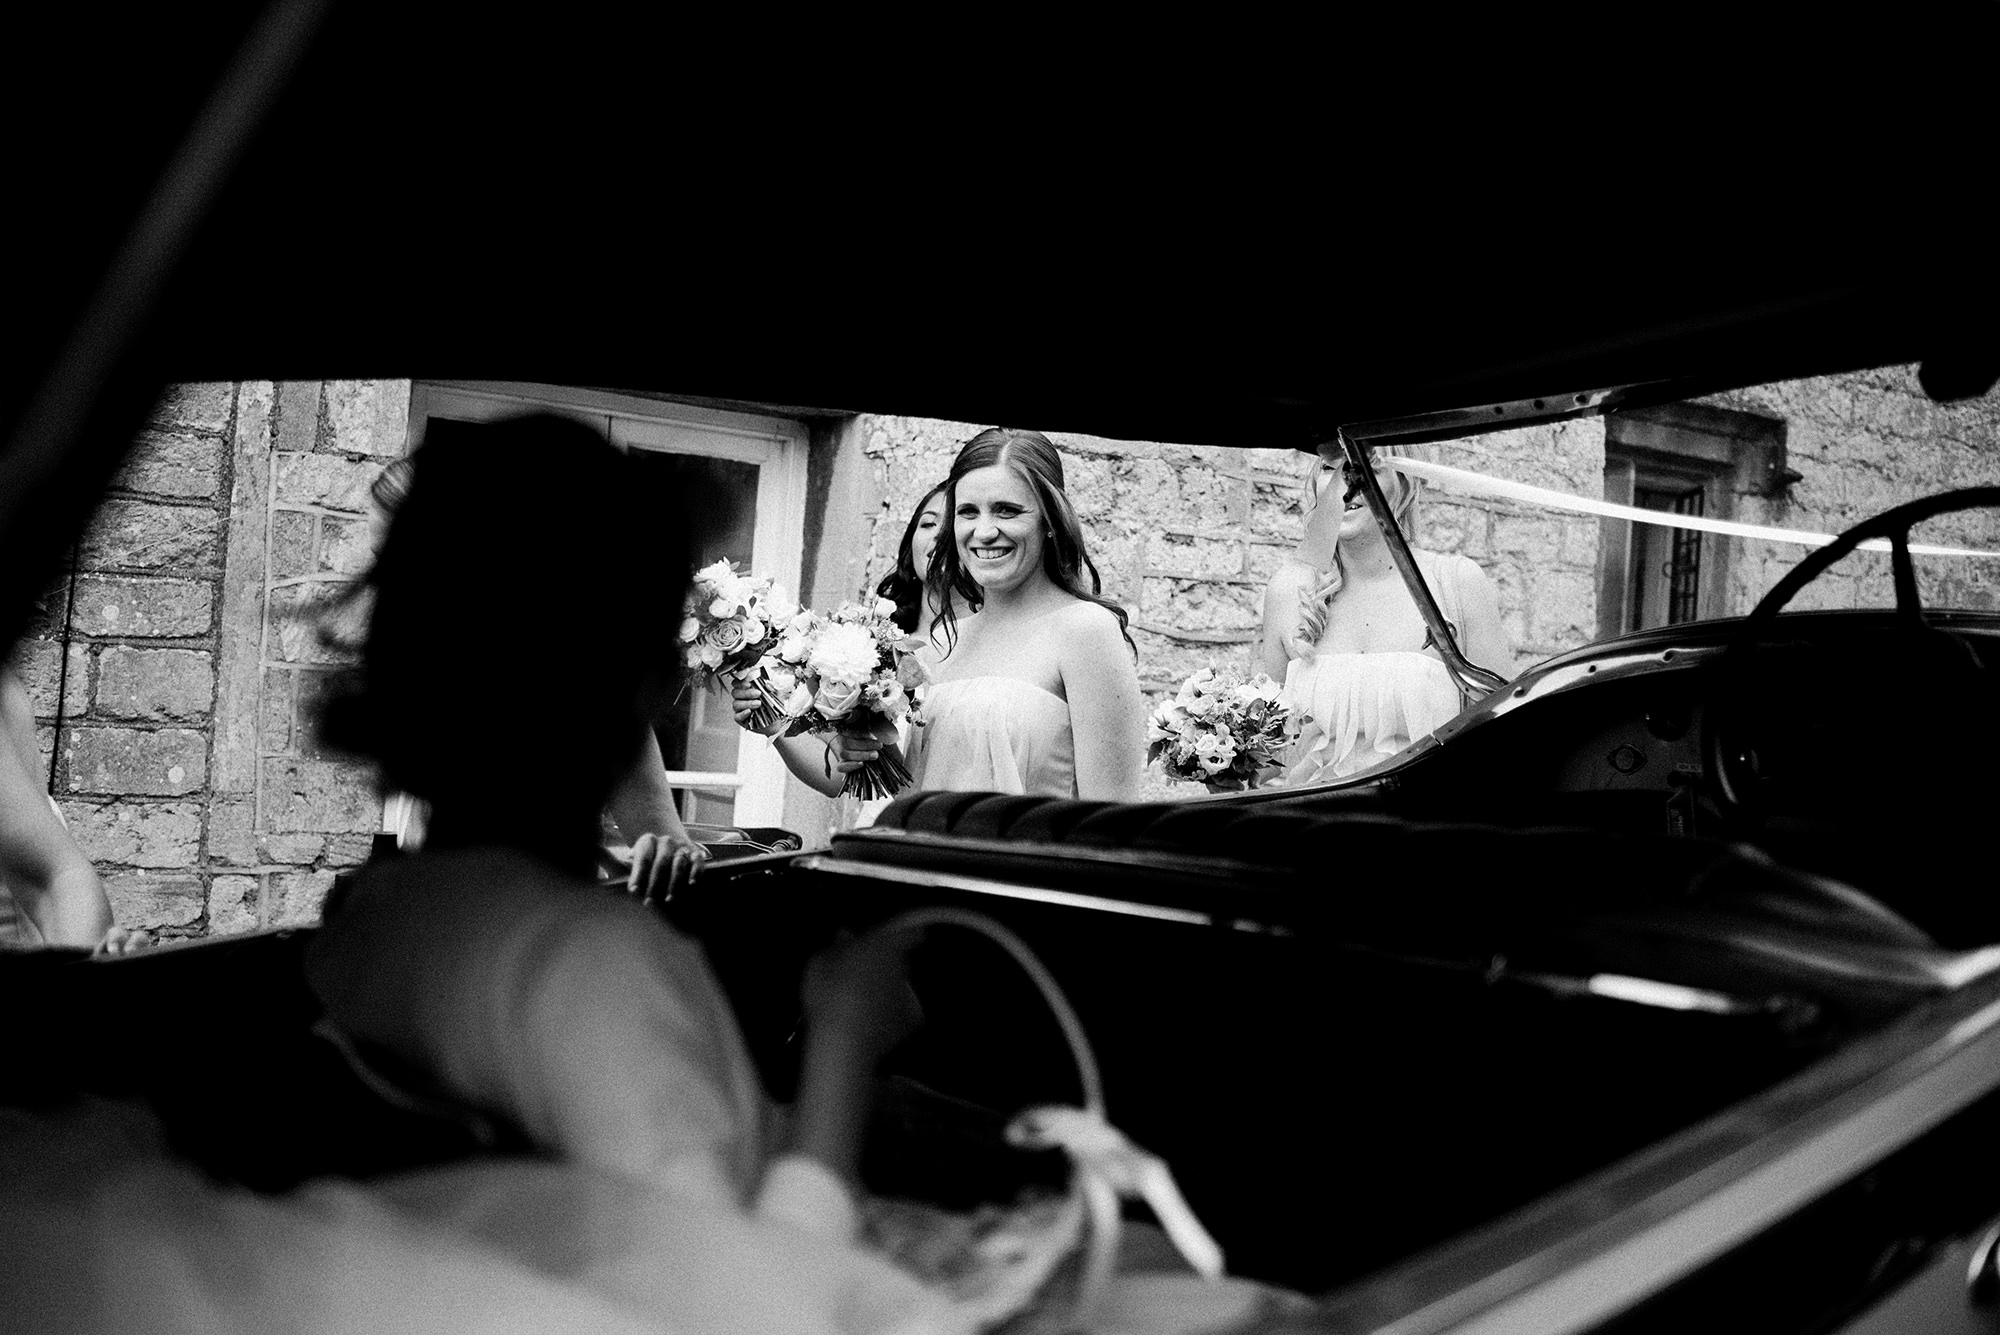 Simon biffen-best of 2015 wedding photographs-33